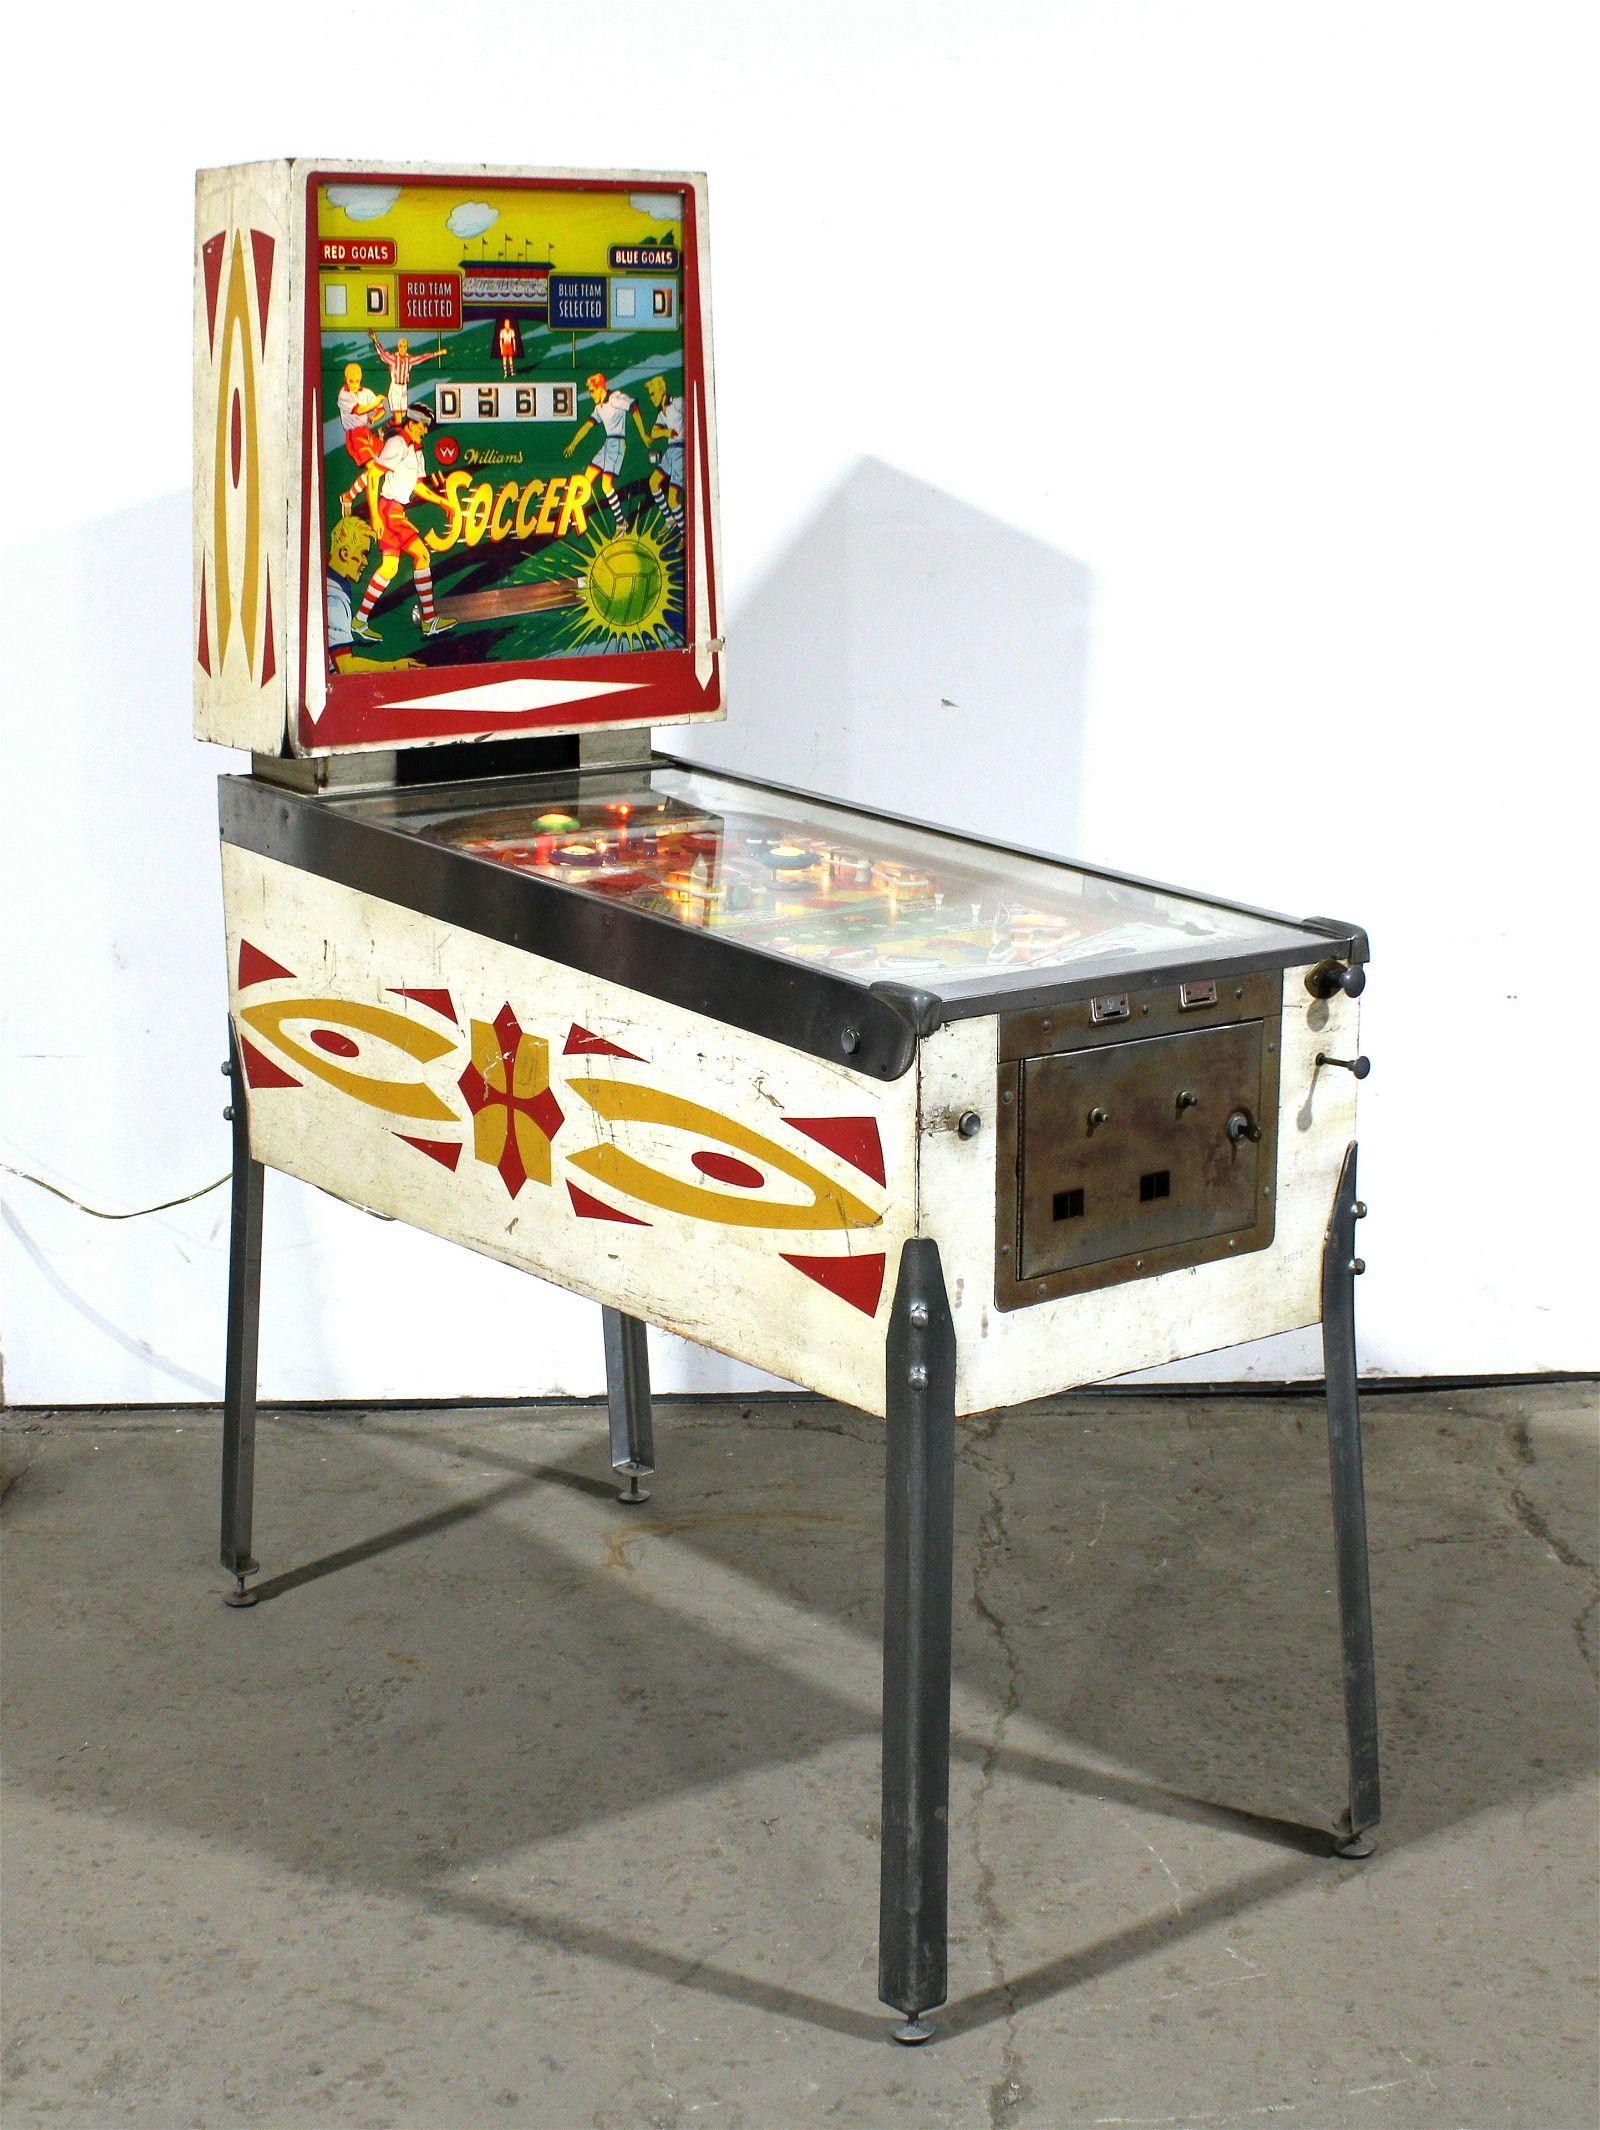 Williams Soccer Reverse Wedgehead Pinball Machine